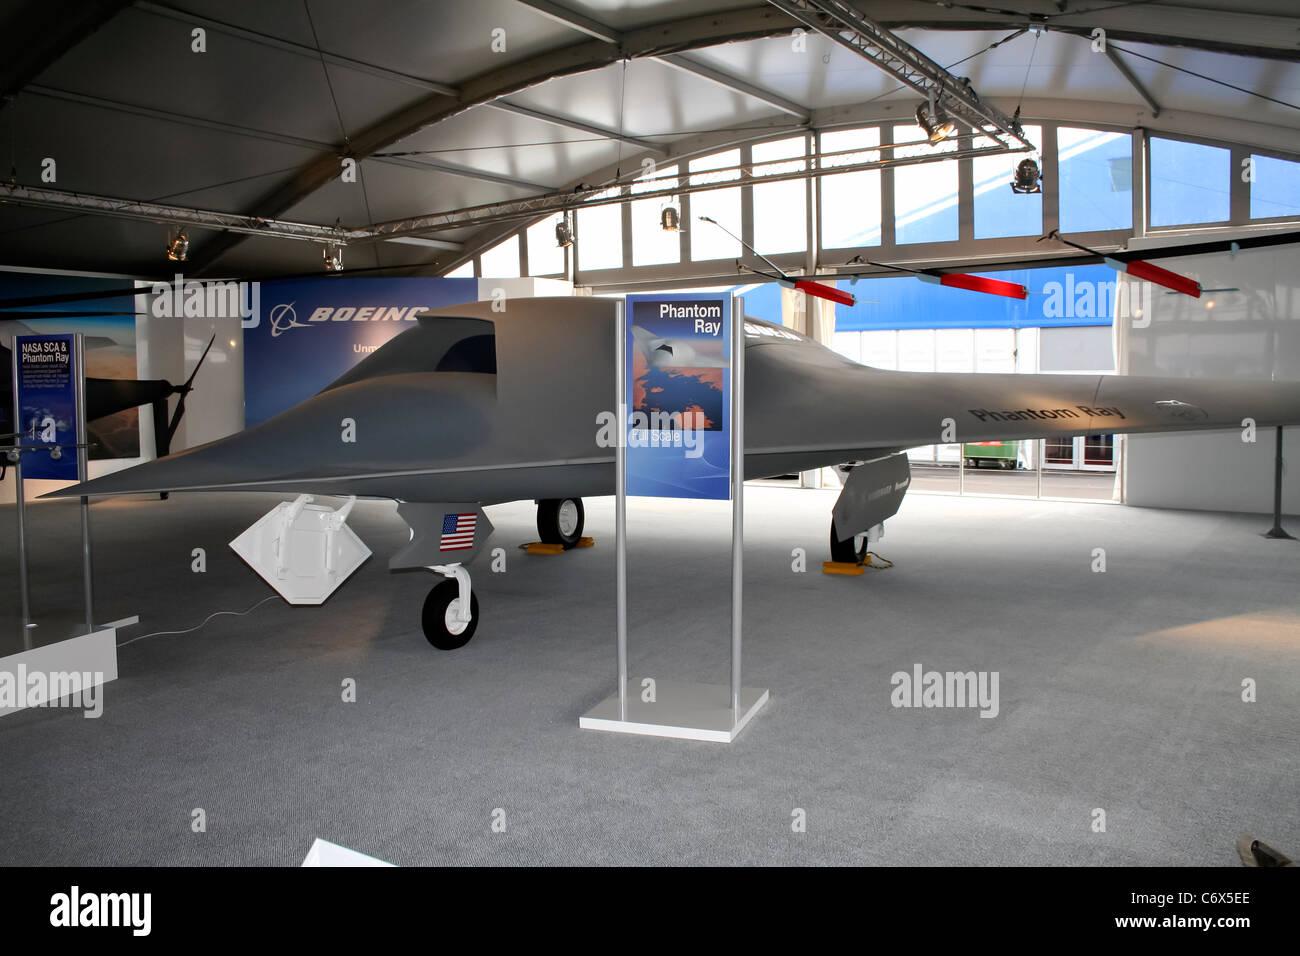 Boeing Phantom Ray UAV at the Farnborough International Airshow - Stock Image